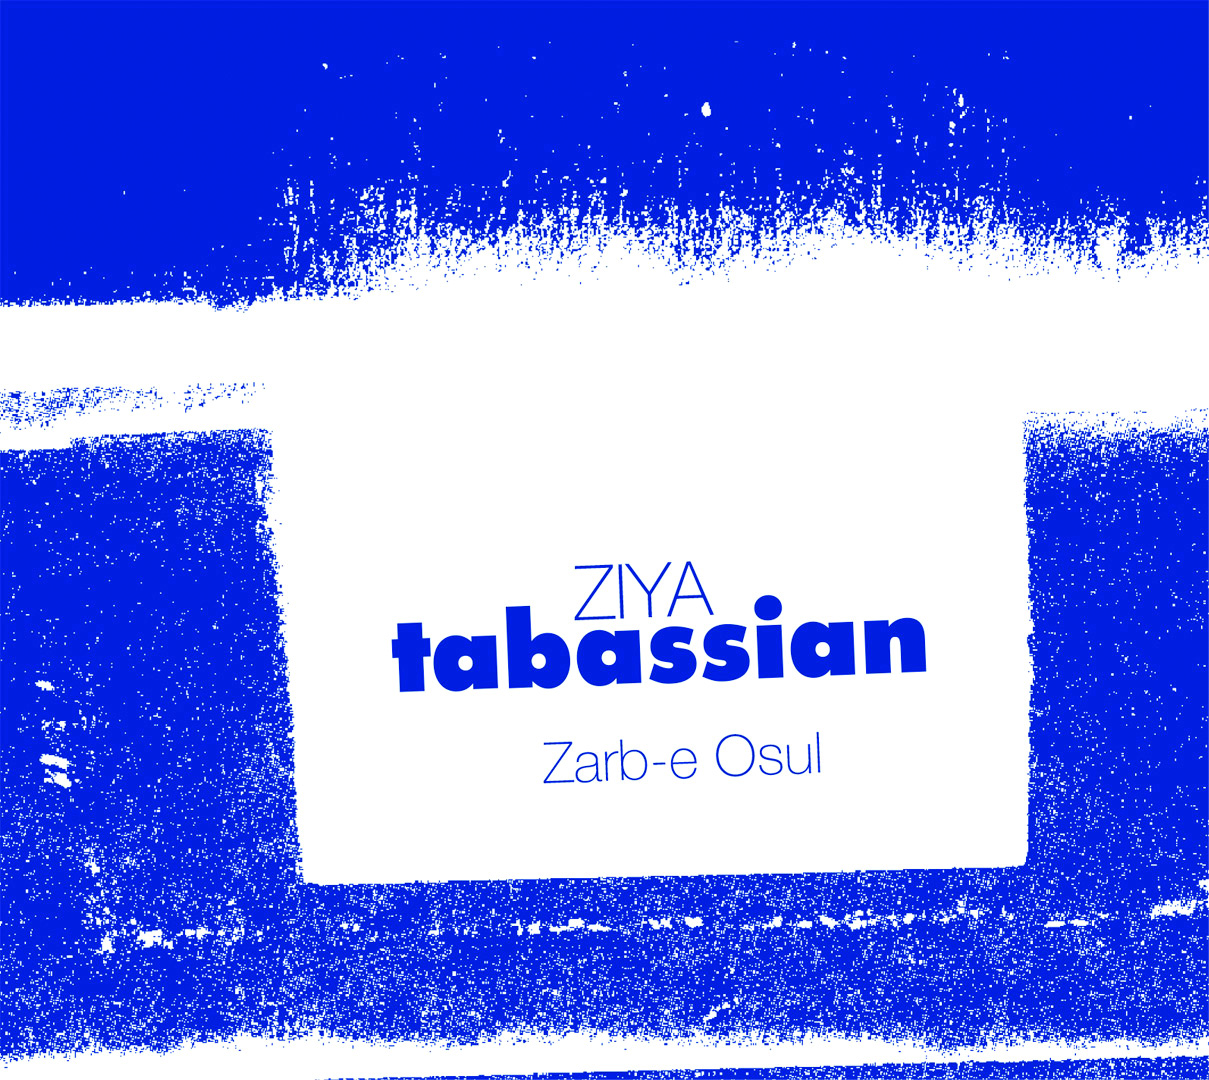 Review of Zarb-e Osul